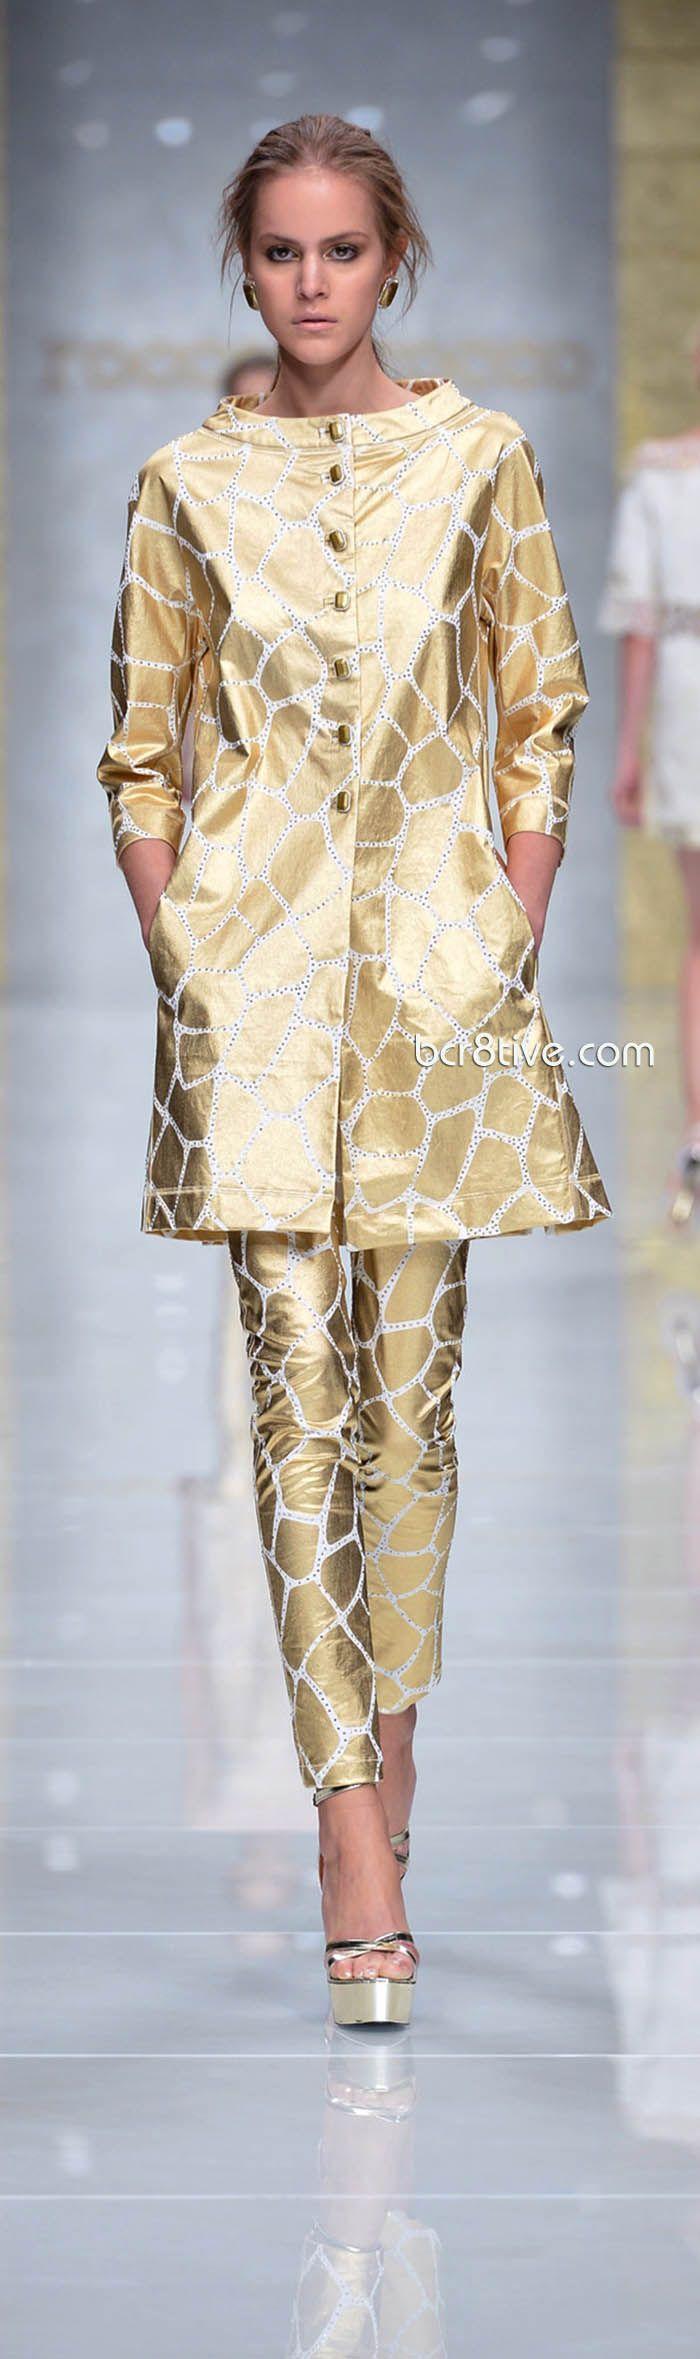 Roccobarocco Spring Summer 2013 http://www.fashion2dream.com/#!fashion-video/c1zvd #video